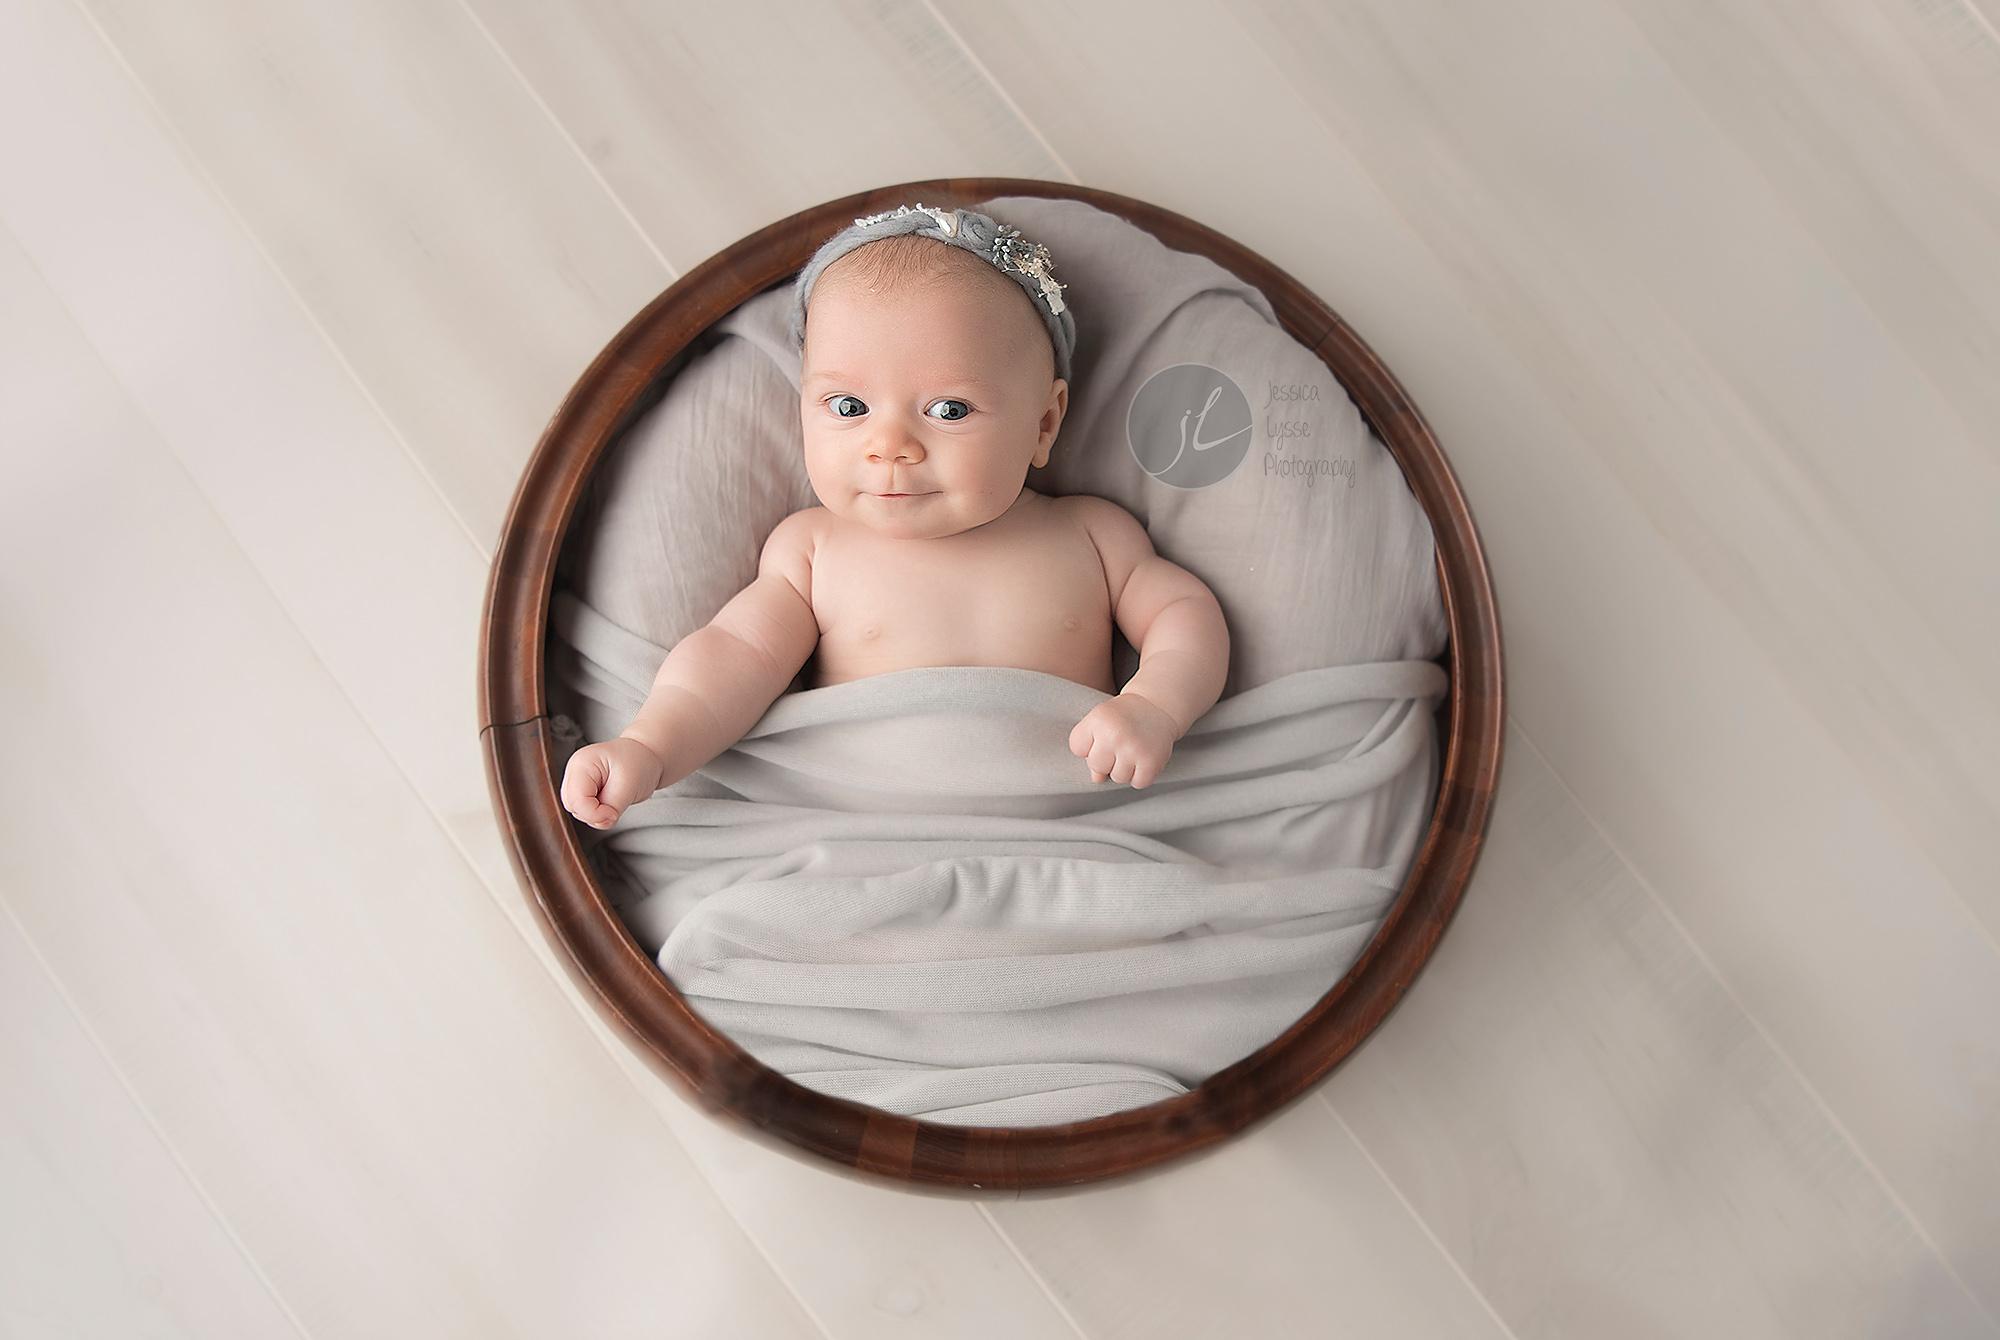 Fullsize Of 11 Week Old Baby